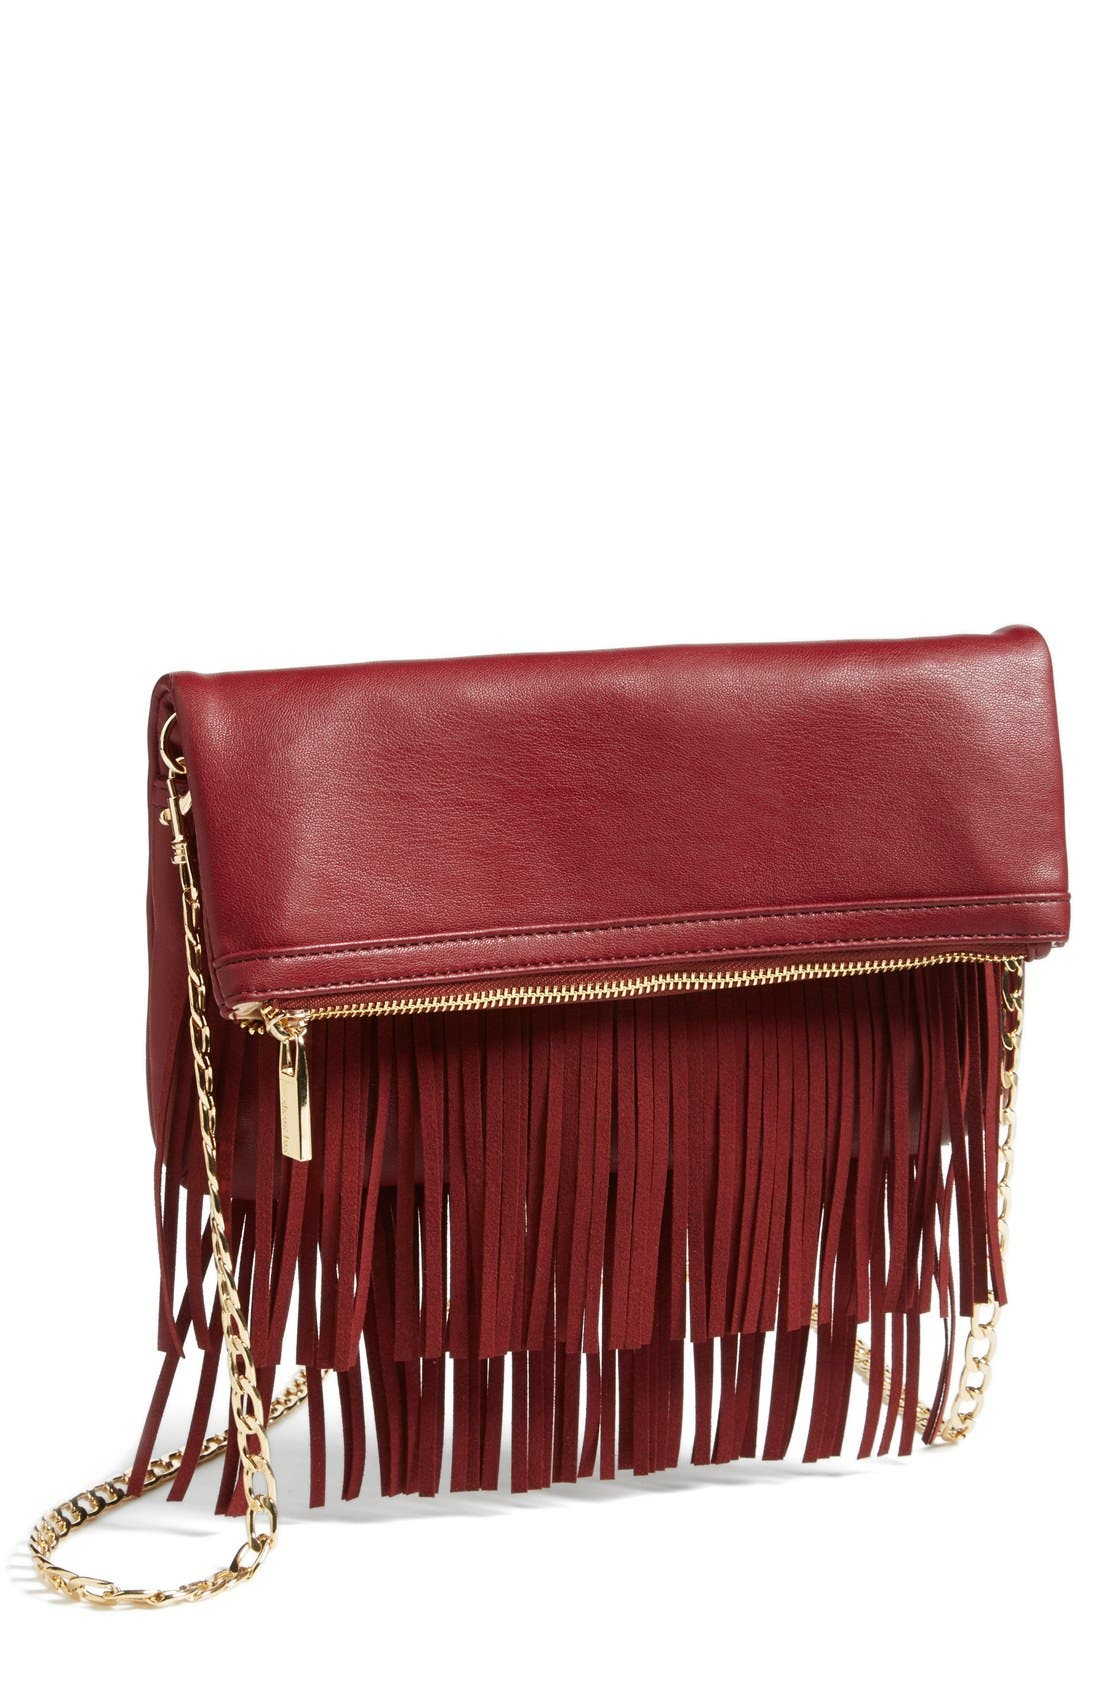 Main Image - Deux Lux 'Joplin' Convertible Foldover Crossbody Bag